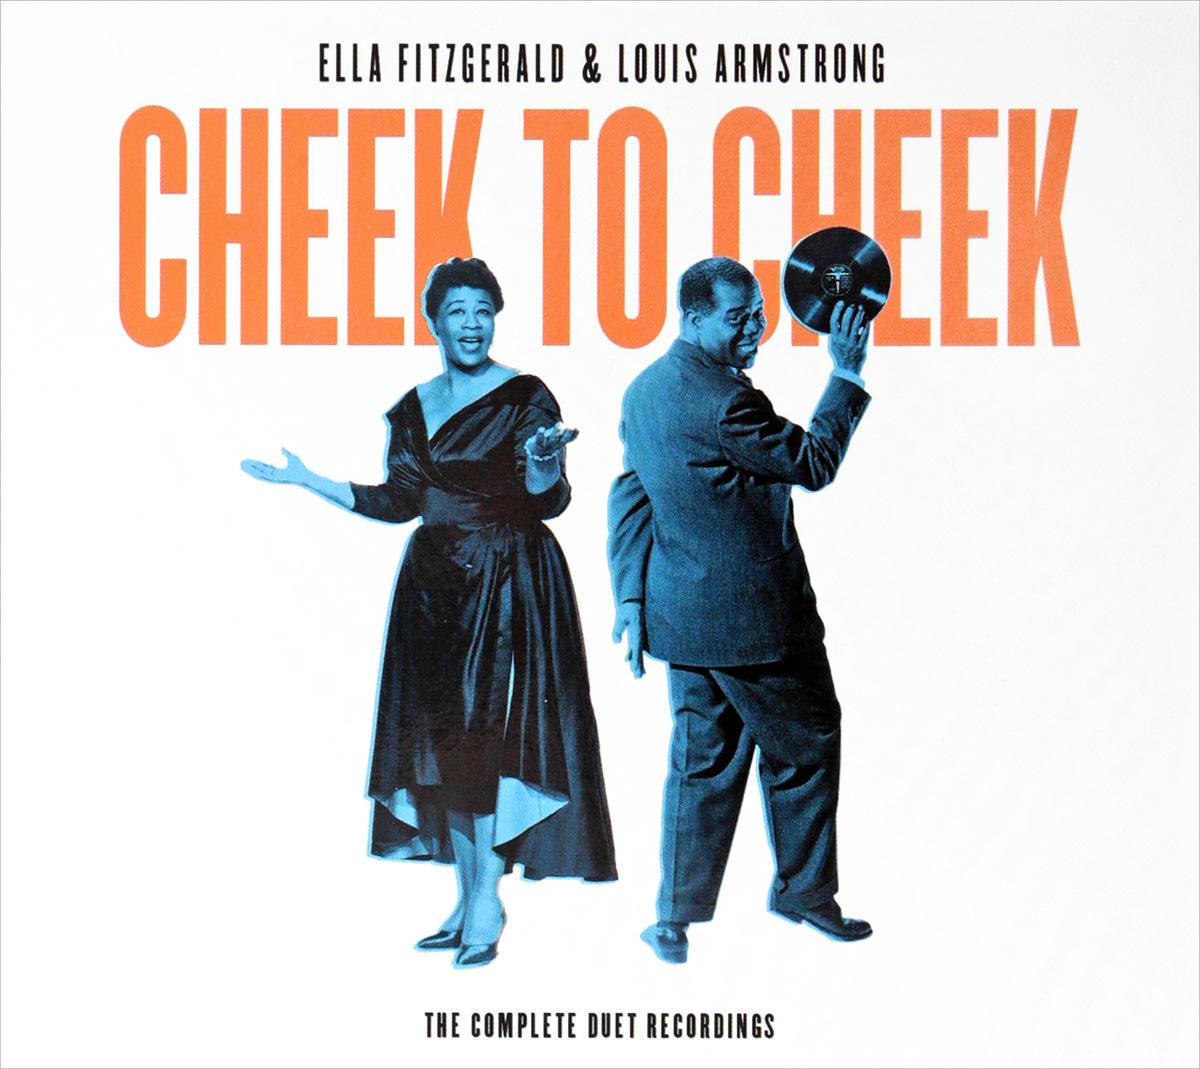 Ella Fitzerald,Louis Armstrong Ella Fitzerald & Louis Armstrong. Complete Duet Recordings (4 CD) сабо ella ella el023awebb89